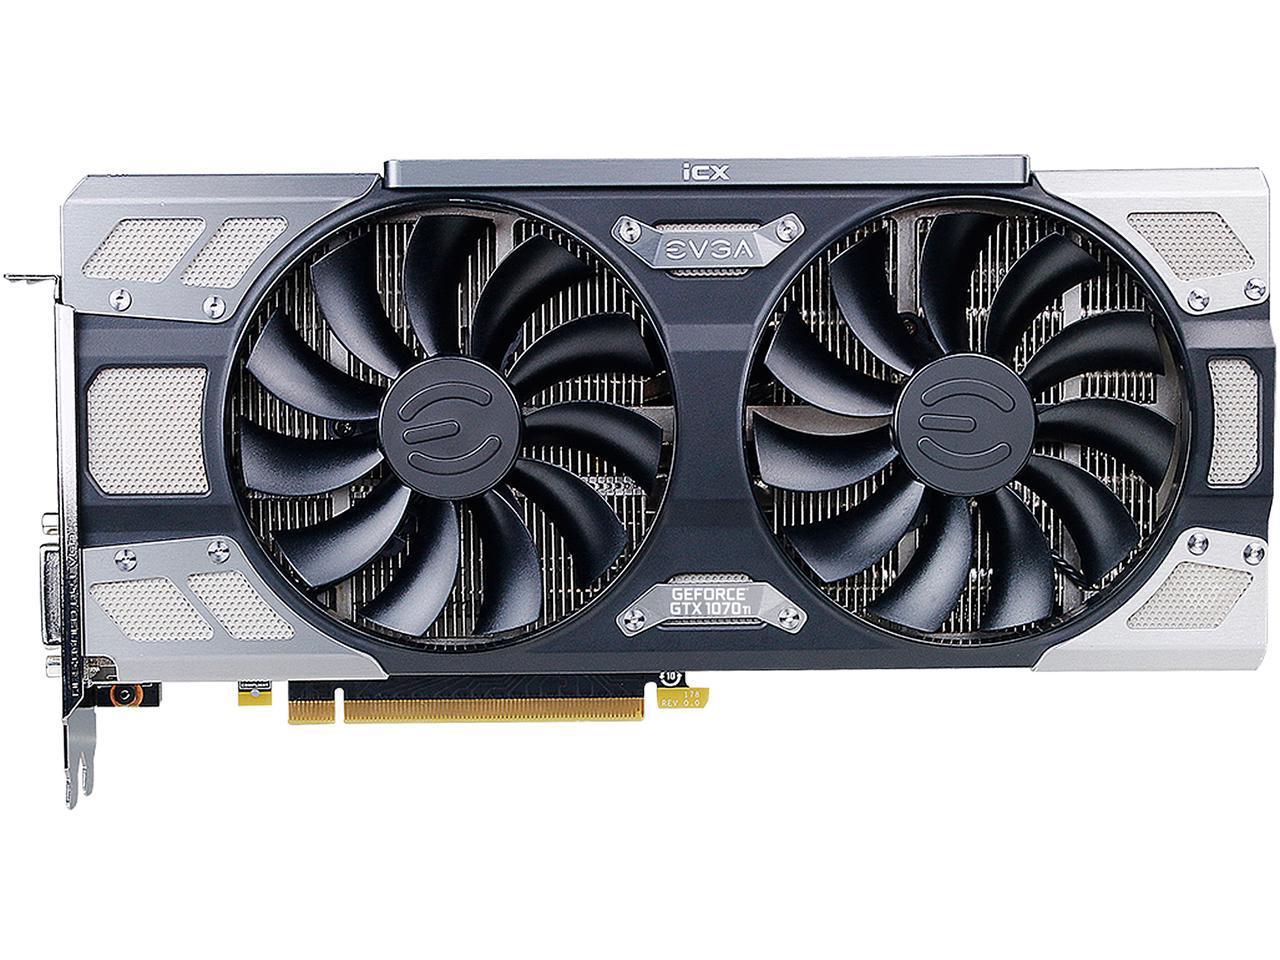 EVGA GeForce GTX 1070 Ti product image